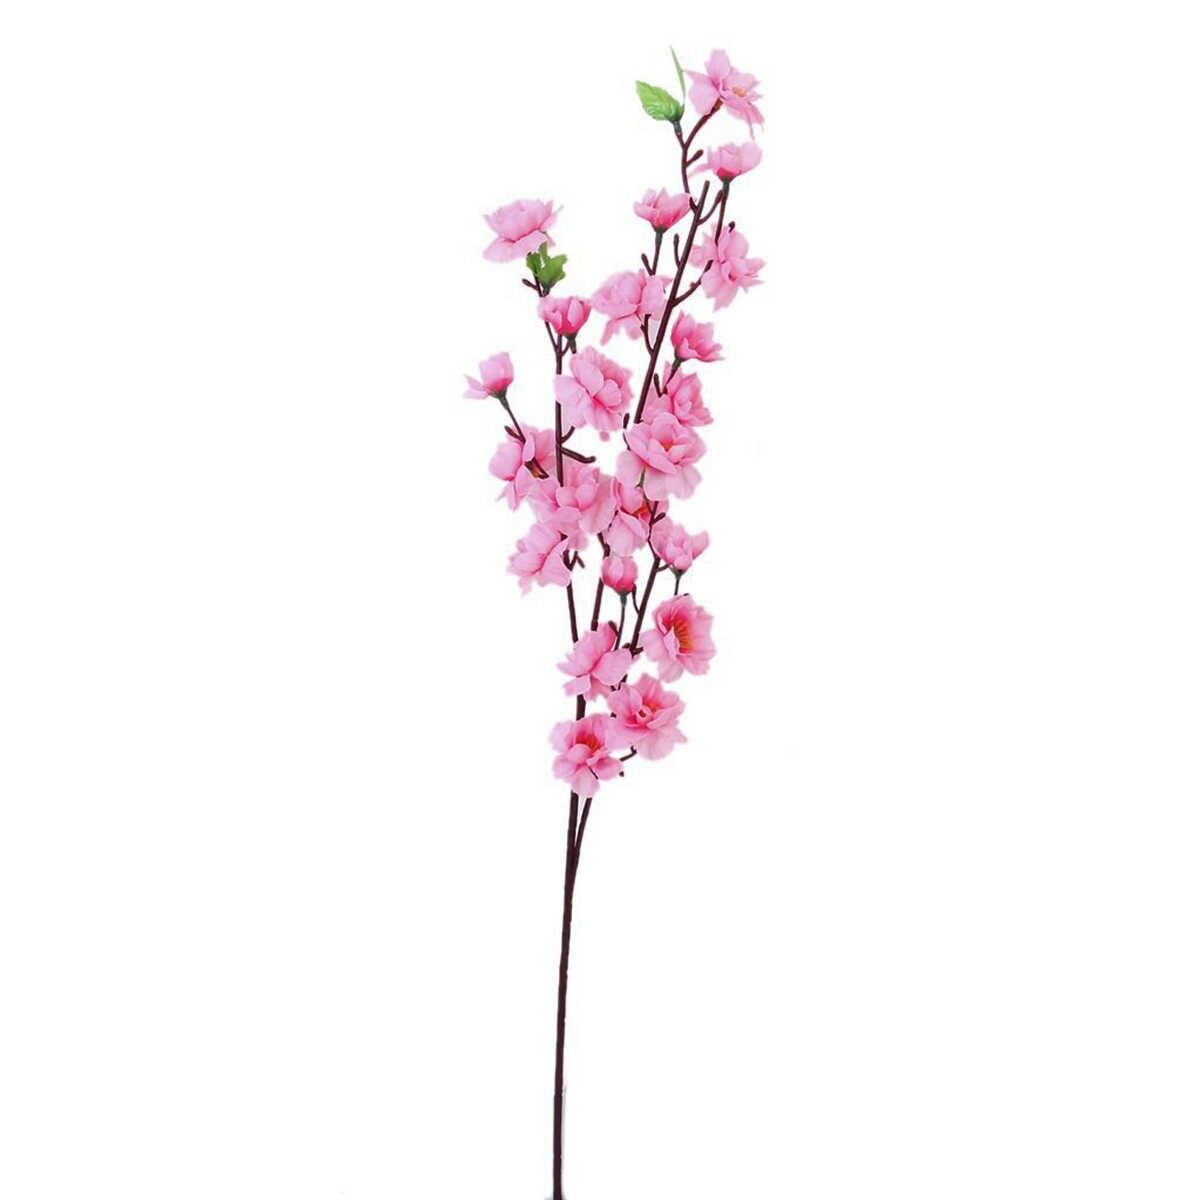 6 stks Perzik Kunstmatige Cherry Lente Pruim Perzik Bloesem Tak Zijde Bloem Boom Voor Wedding Party Decors